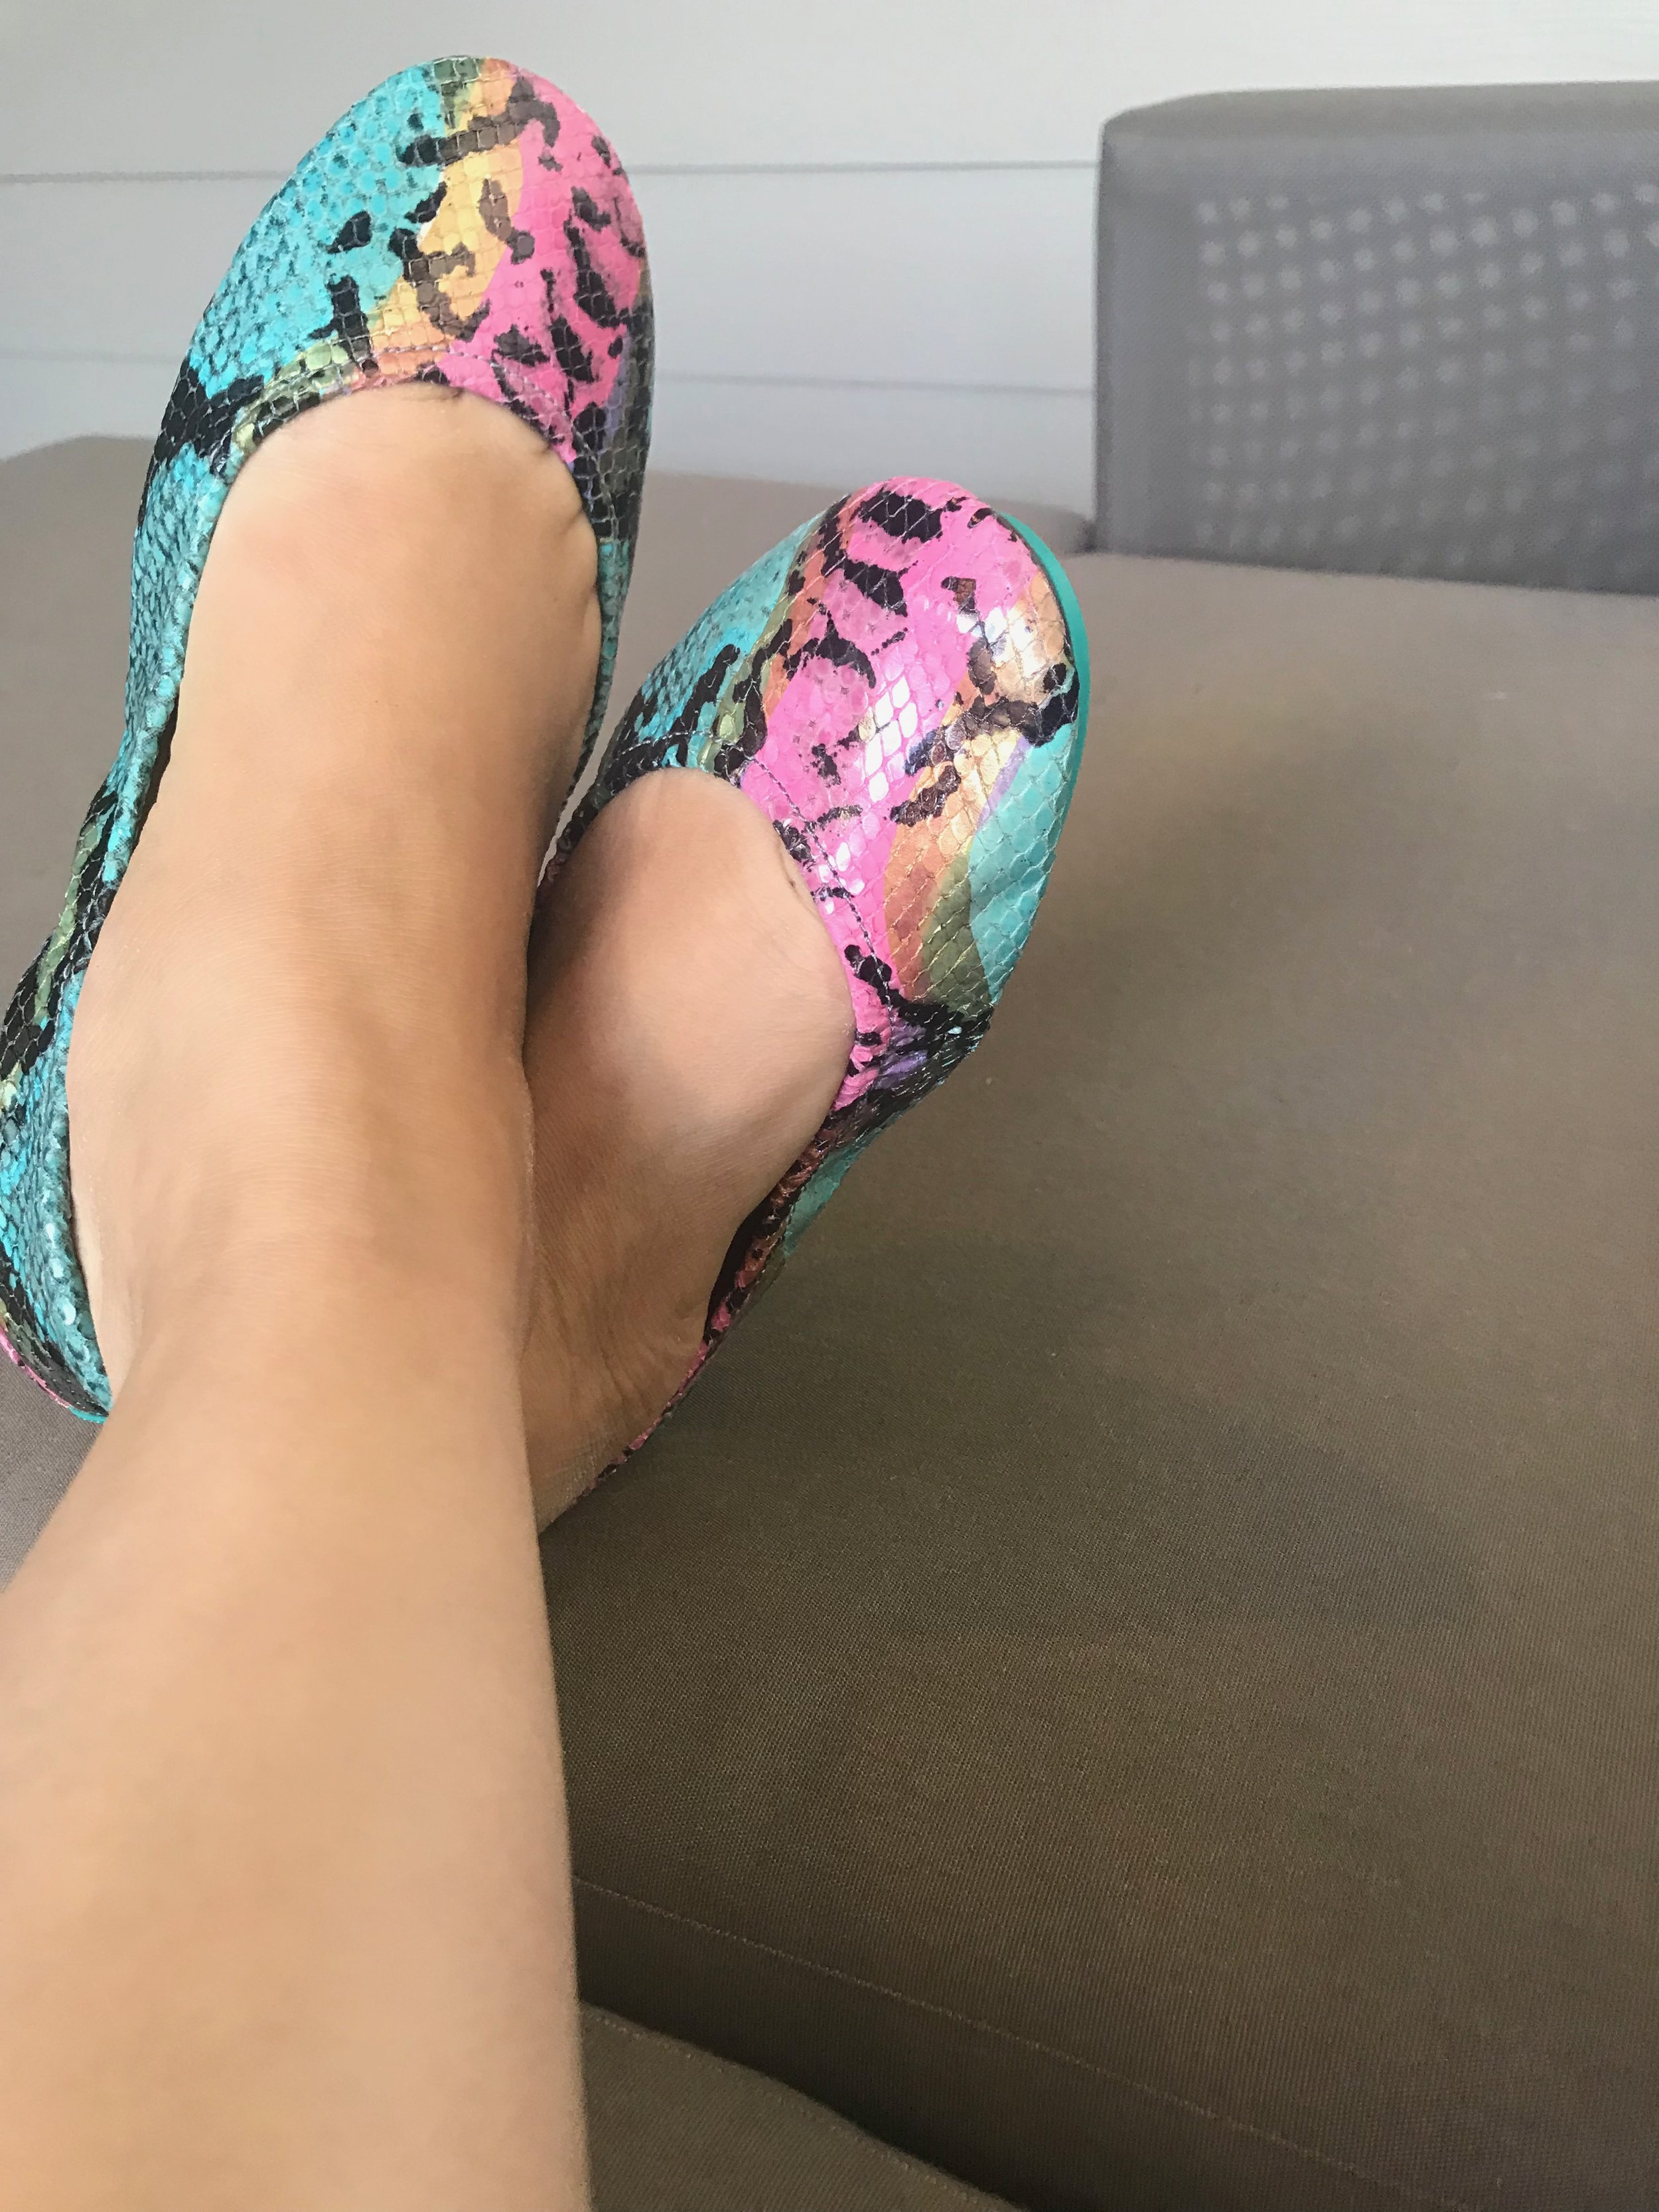 my Tieks Ballet Flats in Electric Snake